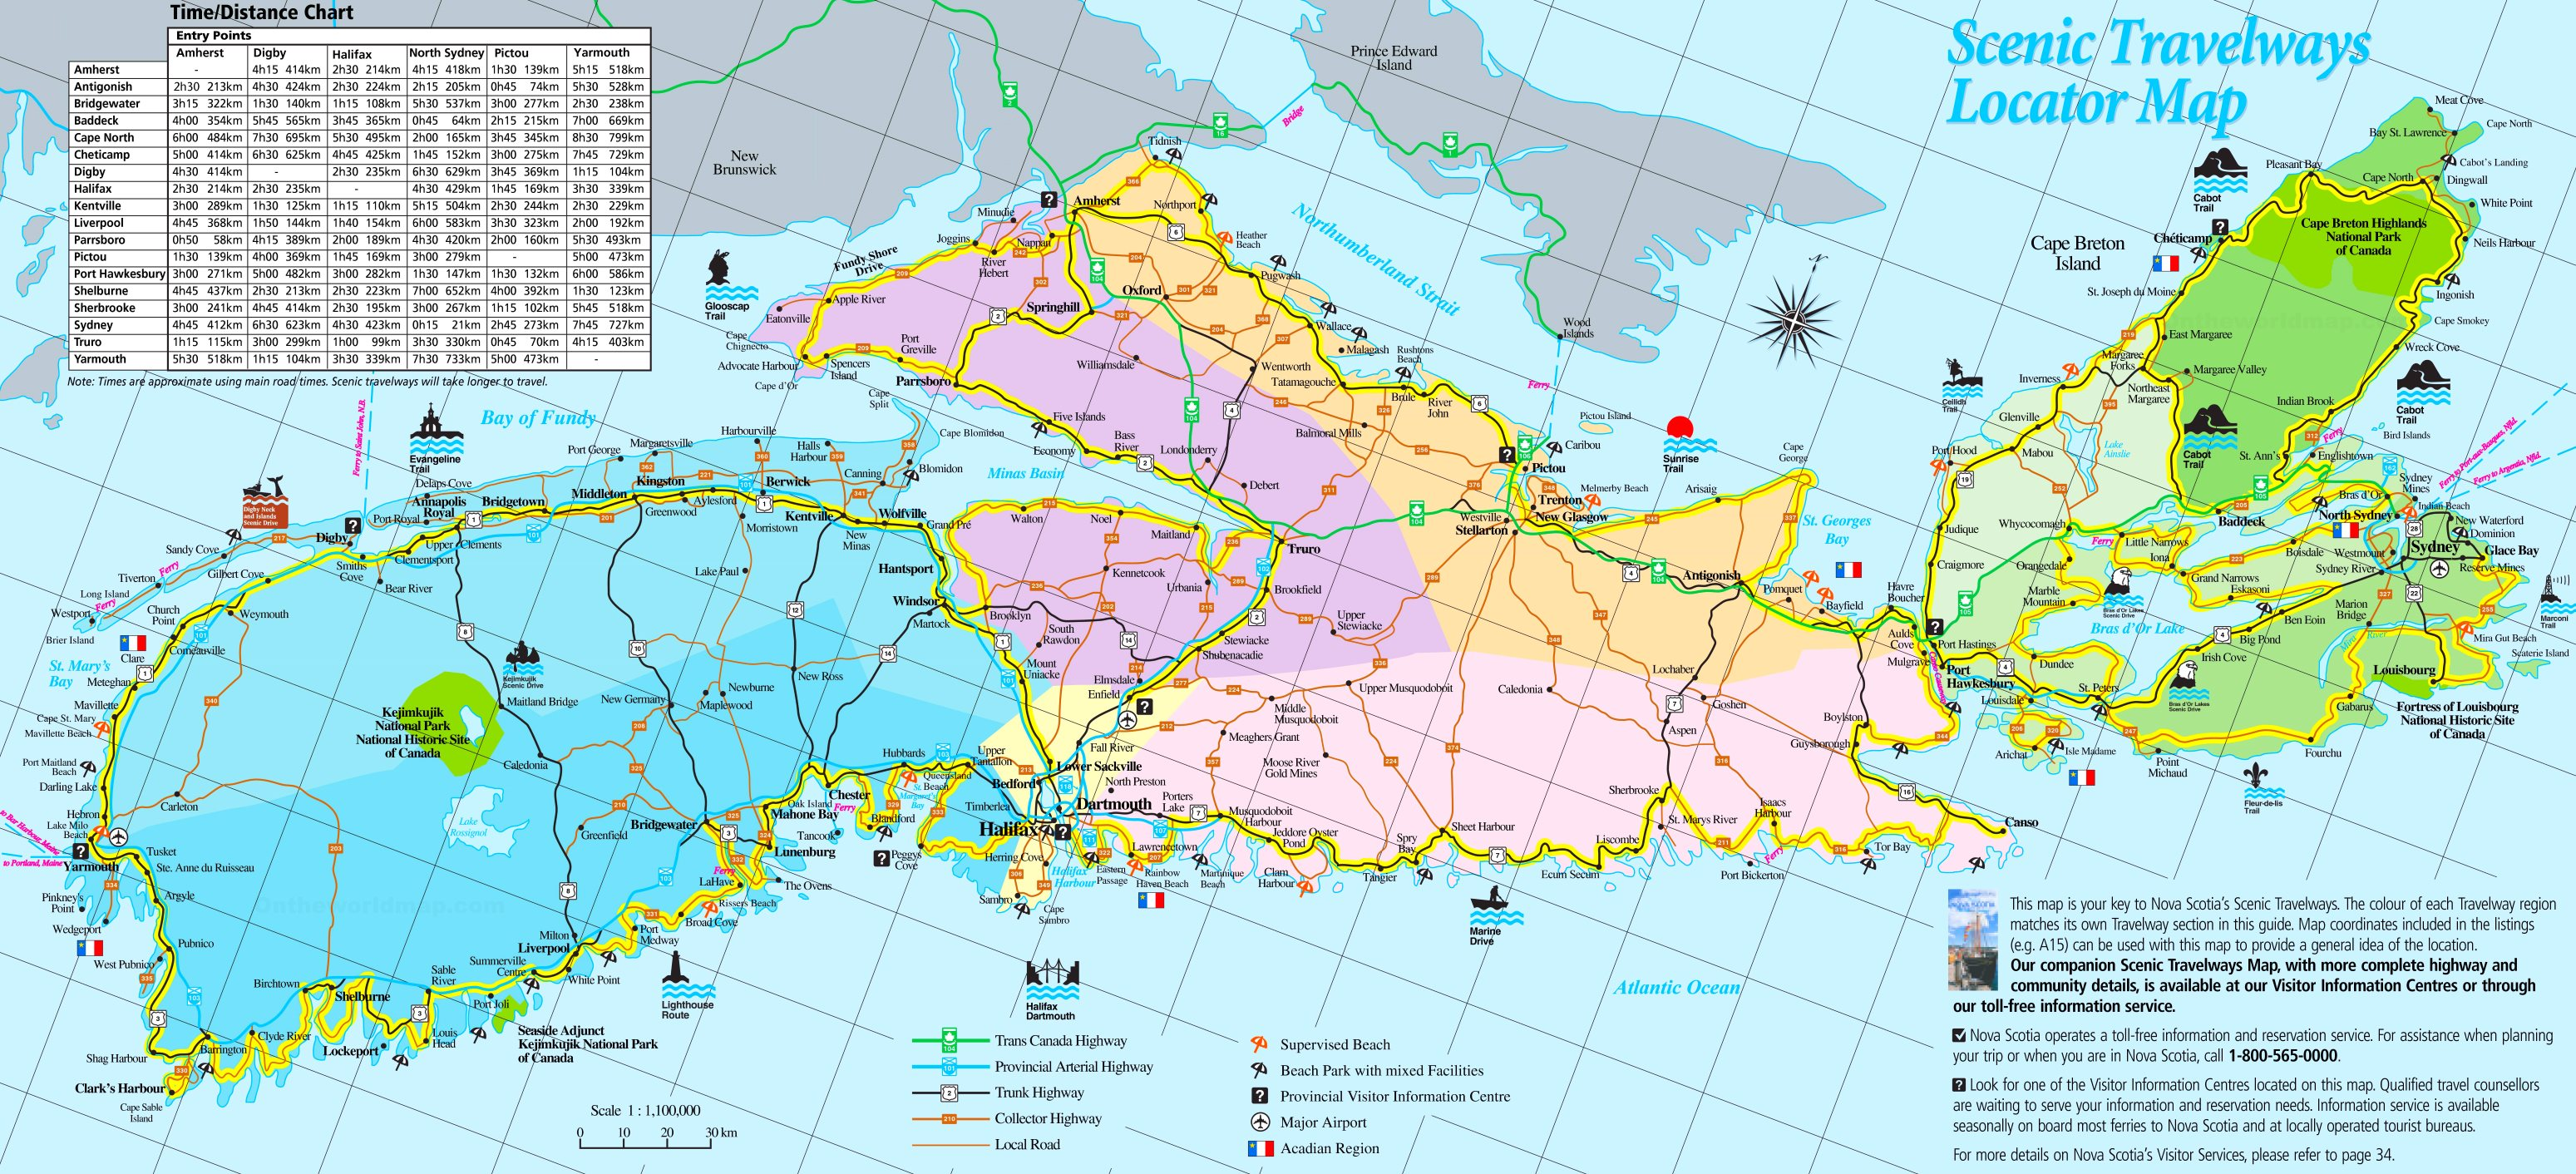 Nova Scotia Canada Map Large detailed tourist map of Nova Scotia